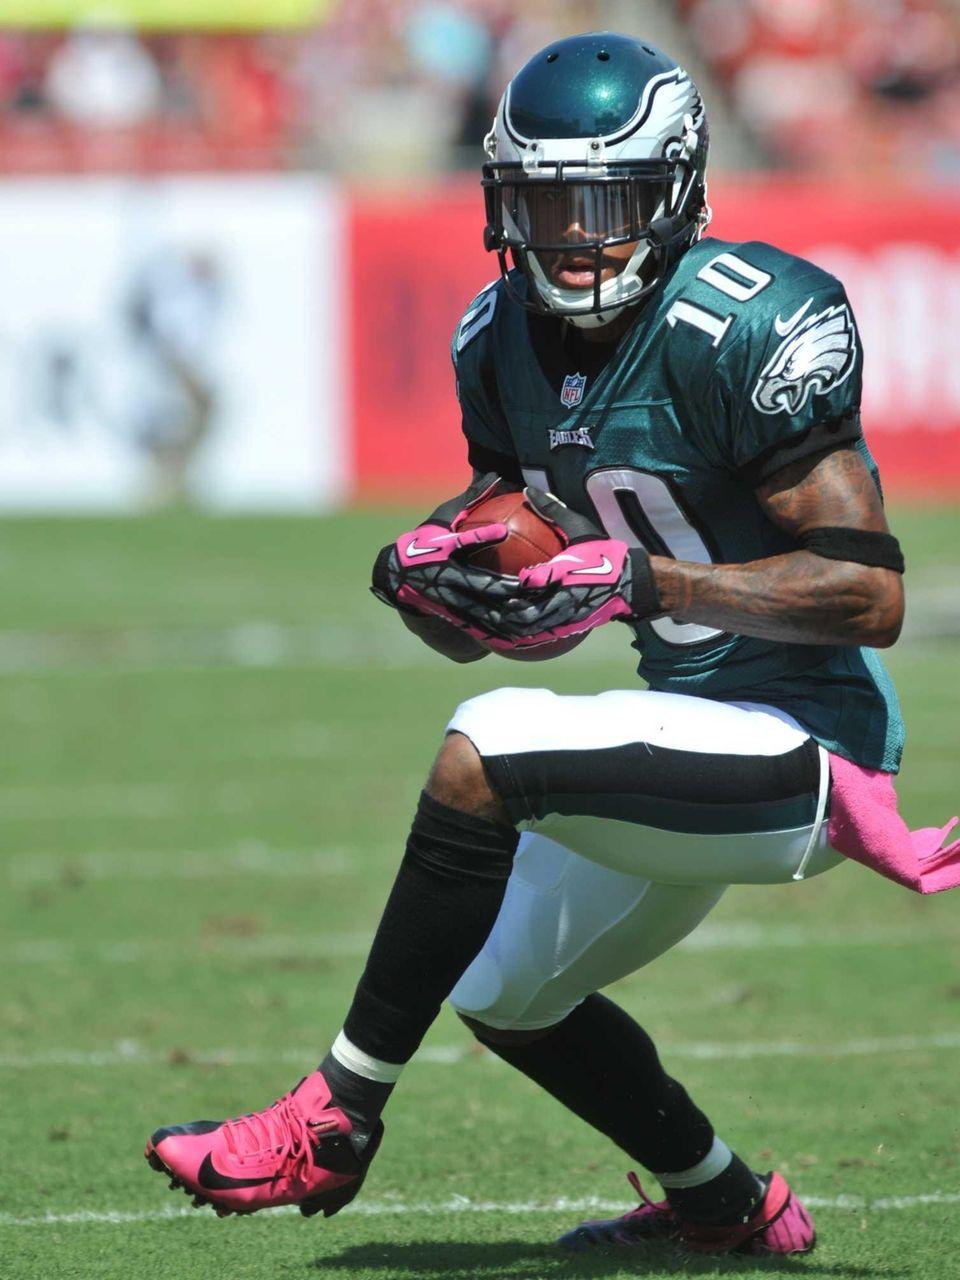 Wide receiver DeSean Jackson of the Philadelphia Eagles